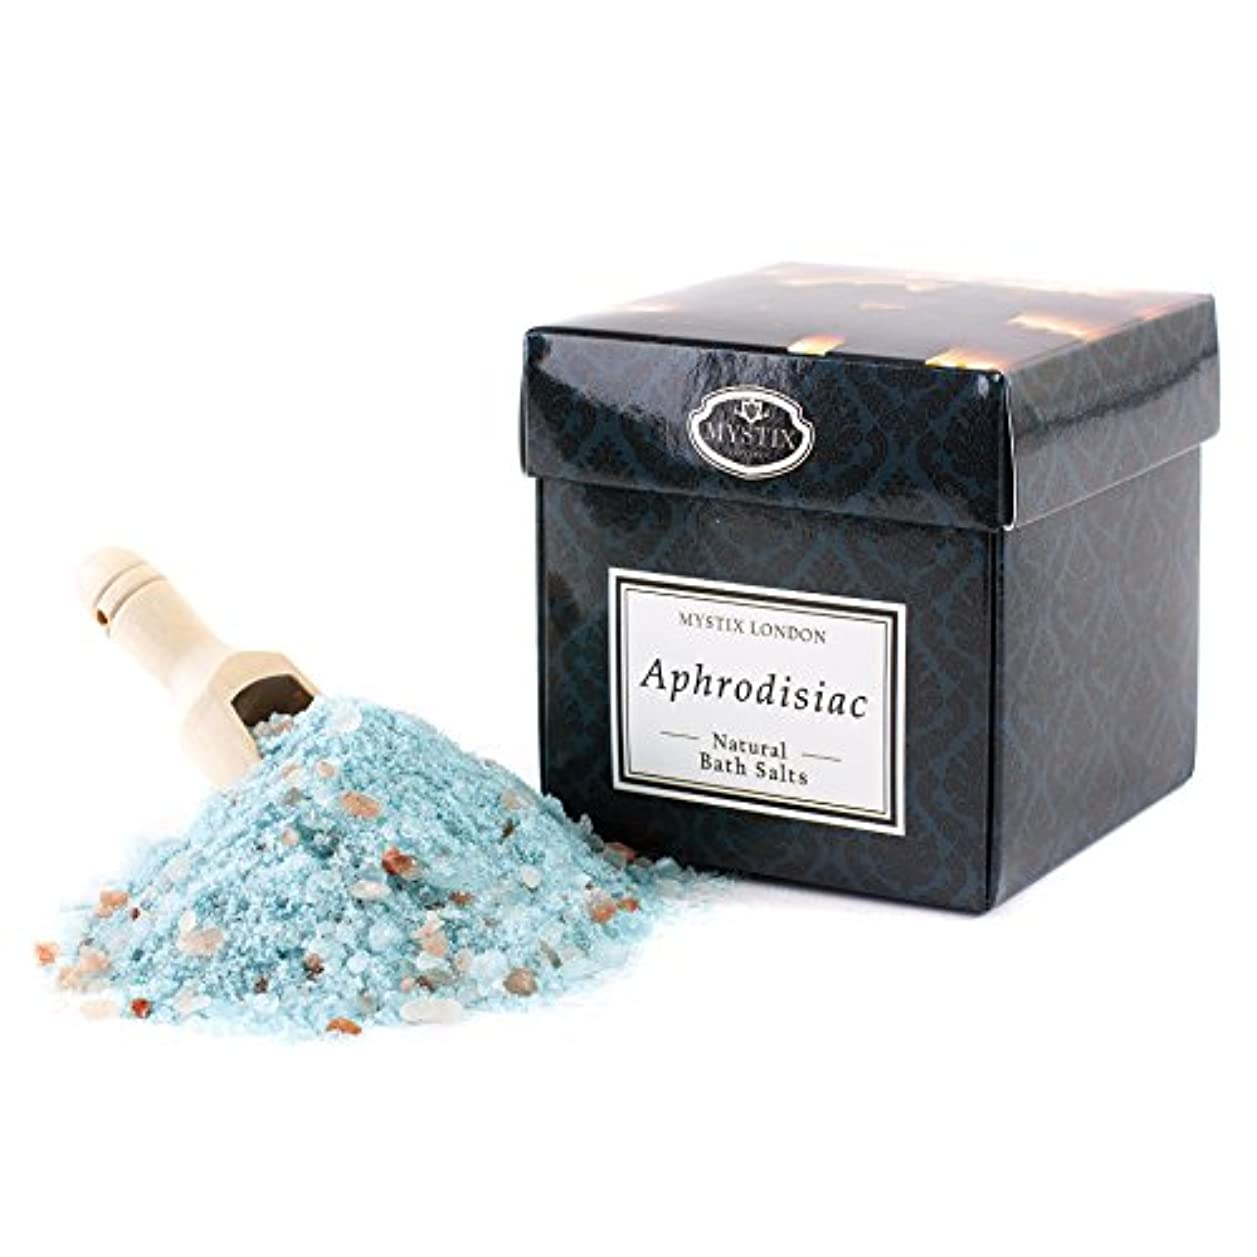 立方体困惑する打撃Mystix London | Aphrodisiac Bath Salt - 350g